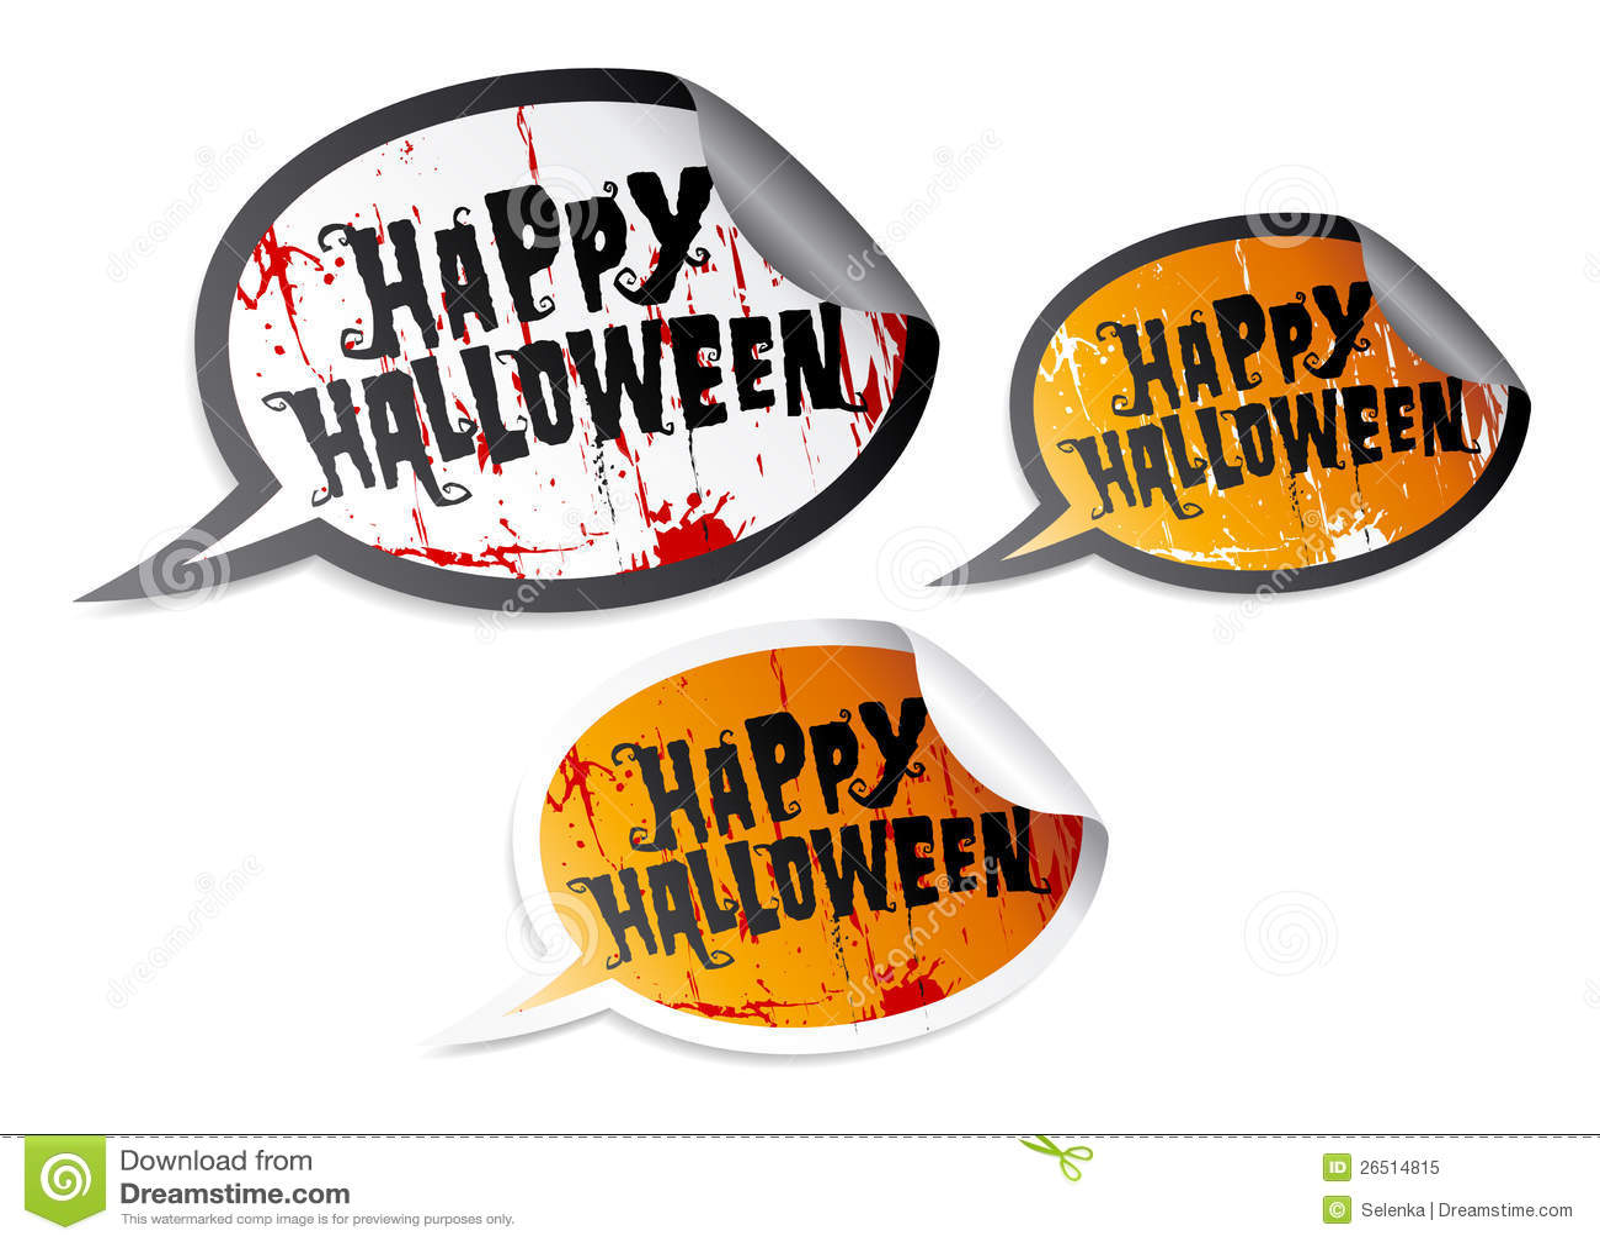 Happy Halloween stickers. Royalty-Free Stock Photo